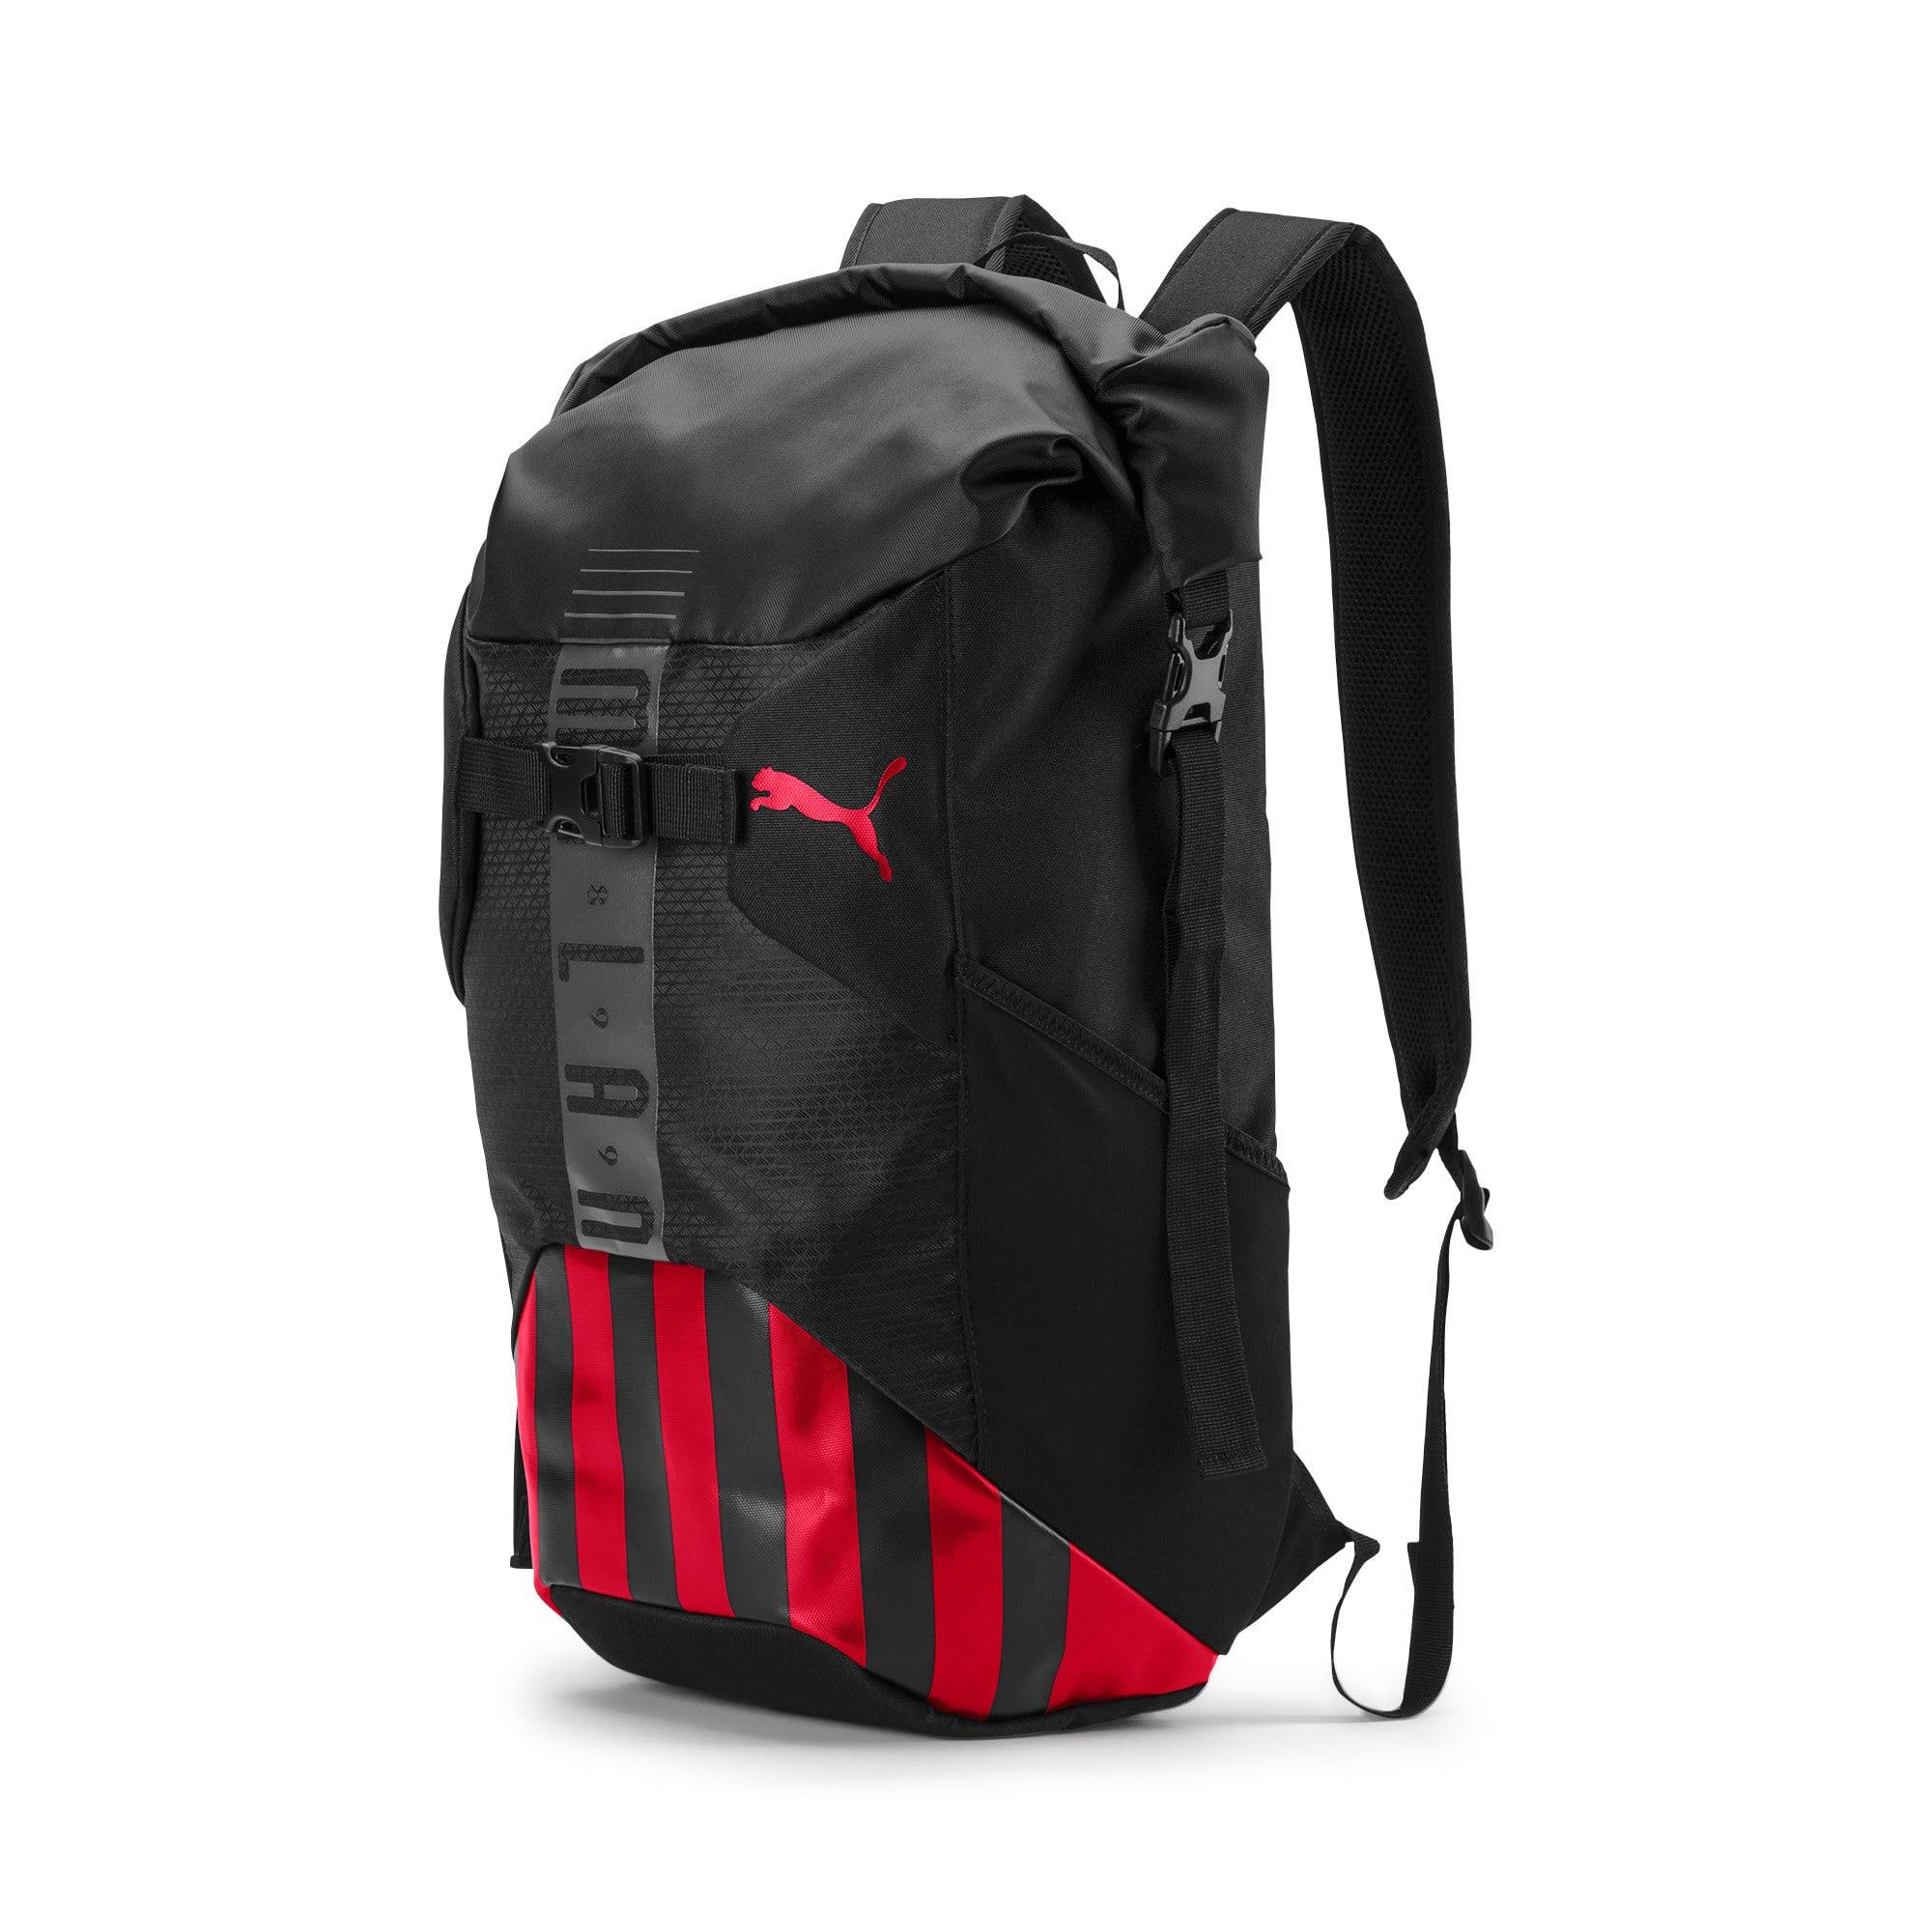 Thumbnail 1 of AC Milan Football Culture Rolltop Backpack, Puma Black-Tango Red, medium